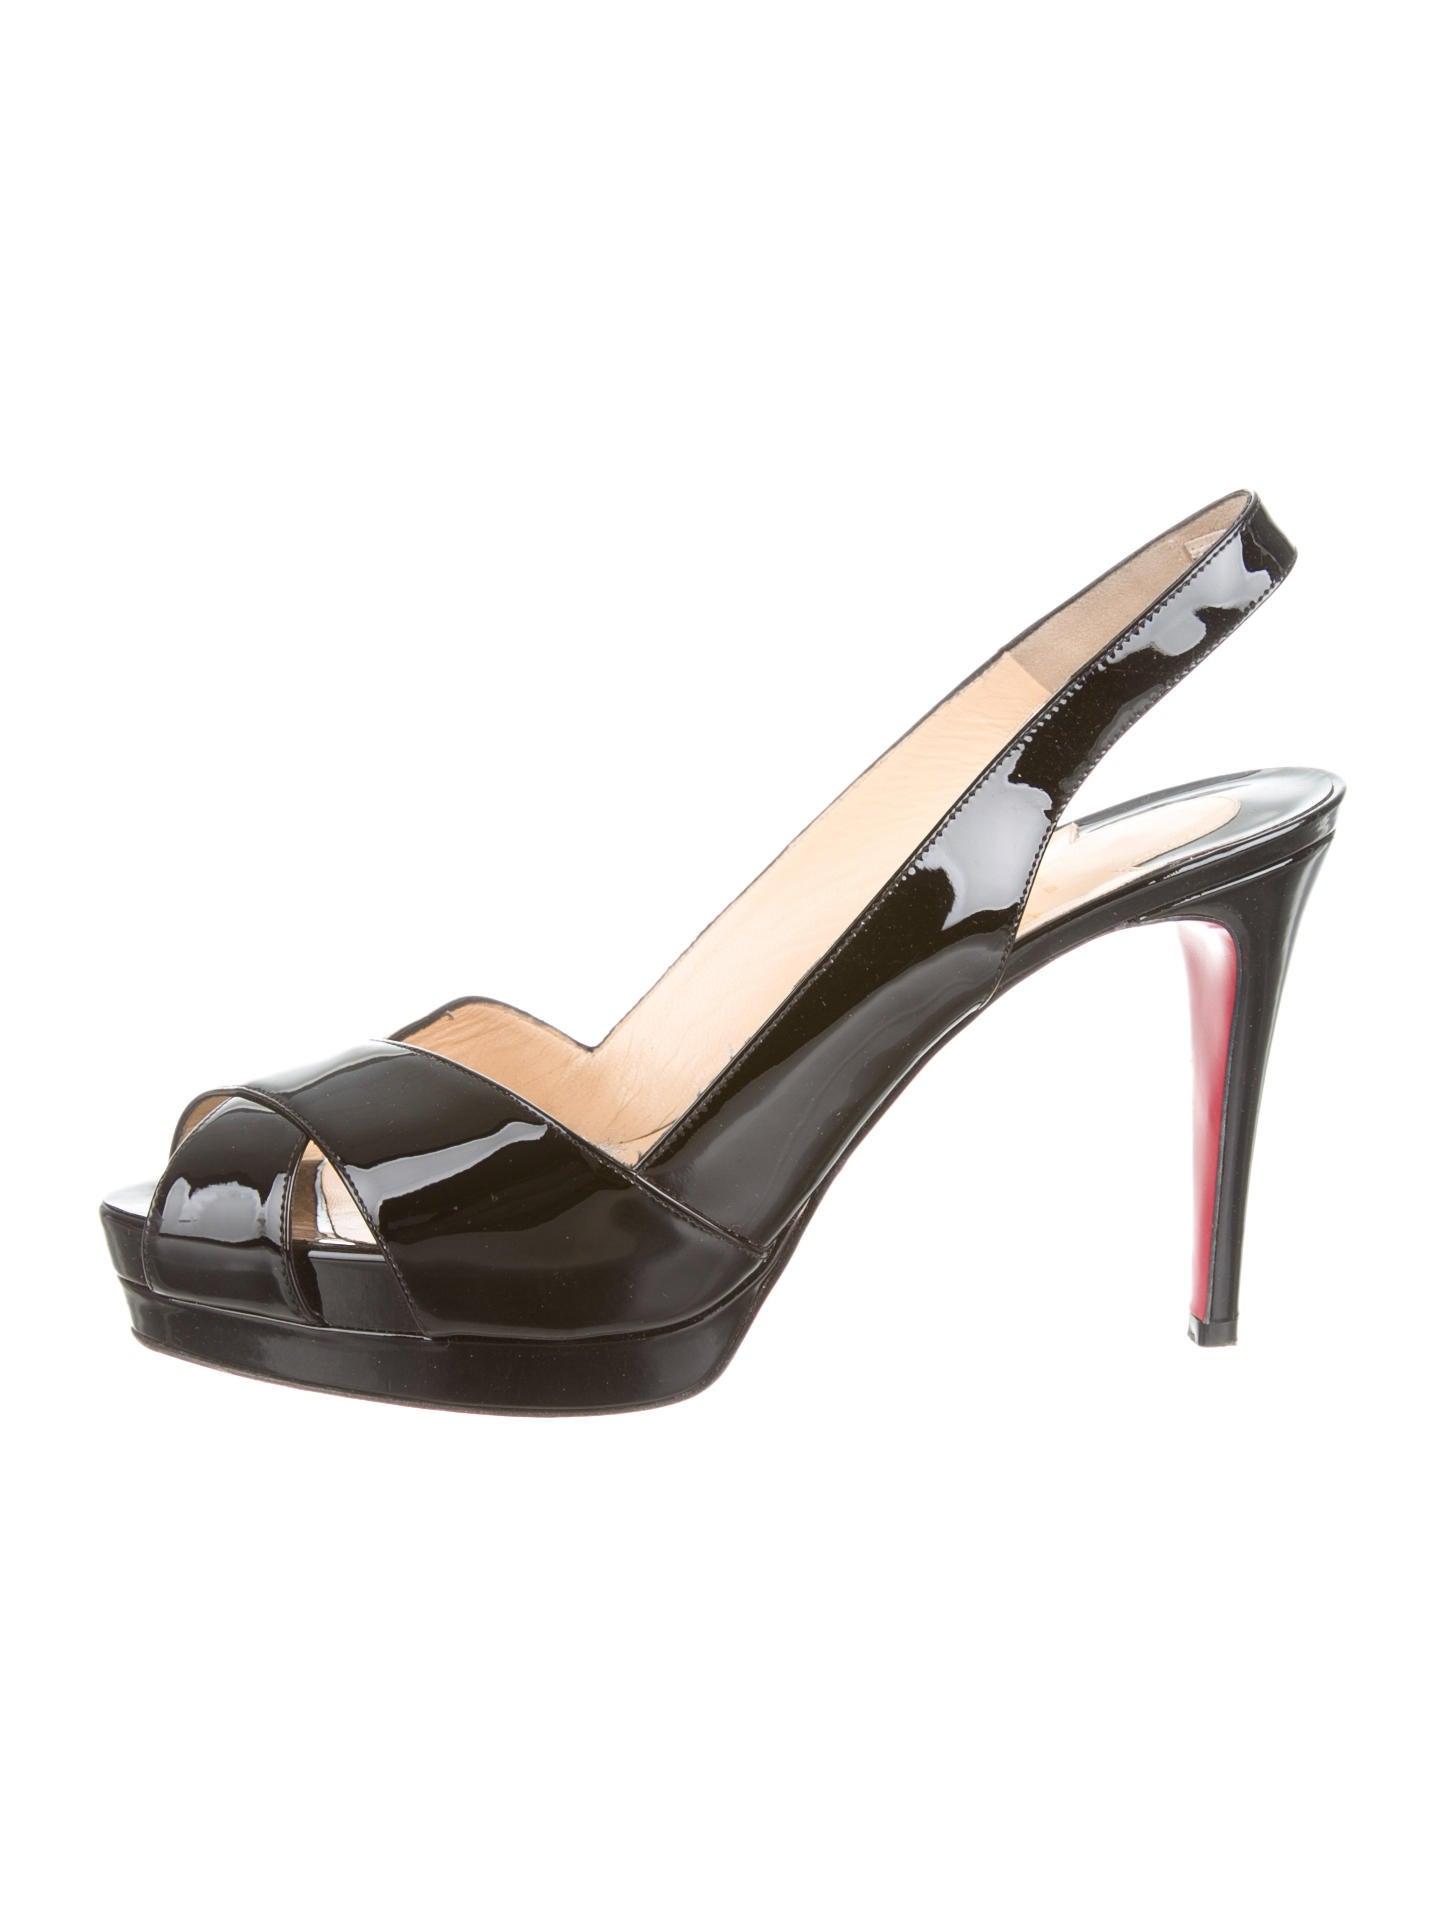 82a33b716689 christian louboutin peep-toe slingback pumps Black patent leather semi  concealed platforms